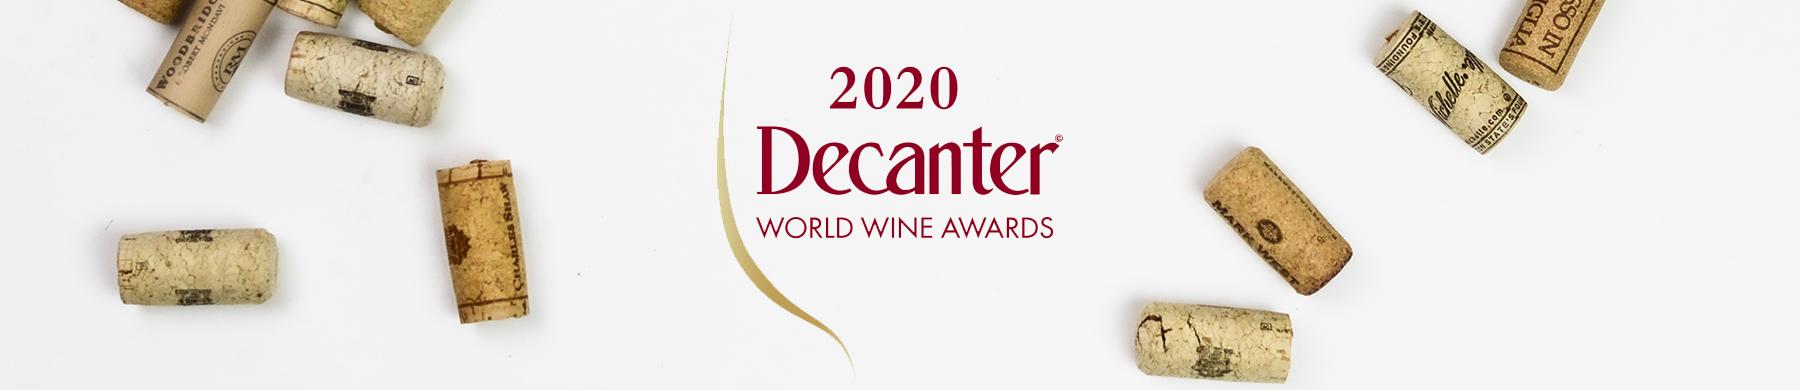 Tre medaglie dai Decanter World Wine Award 2020